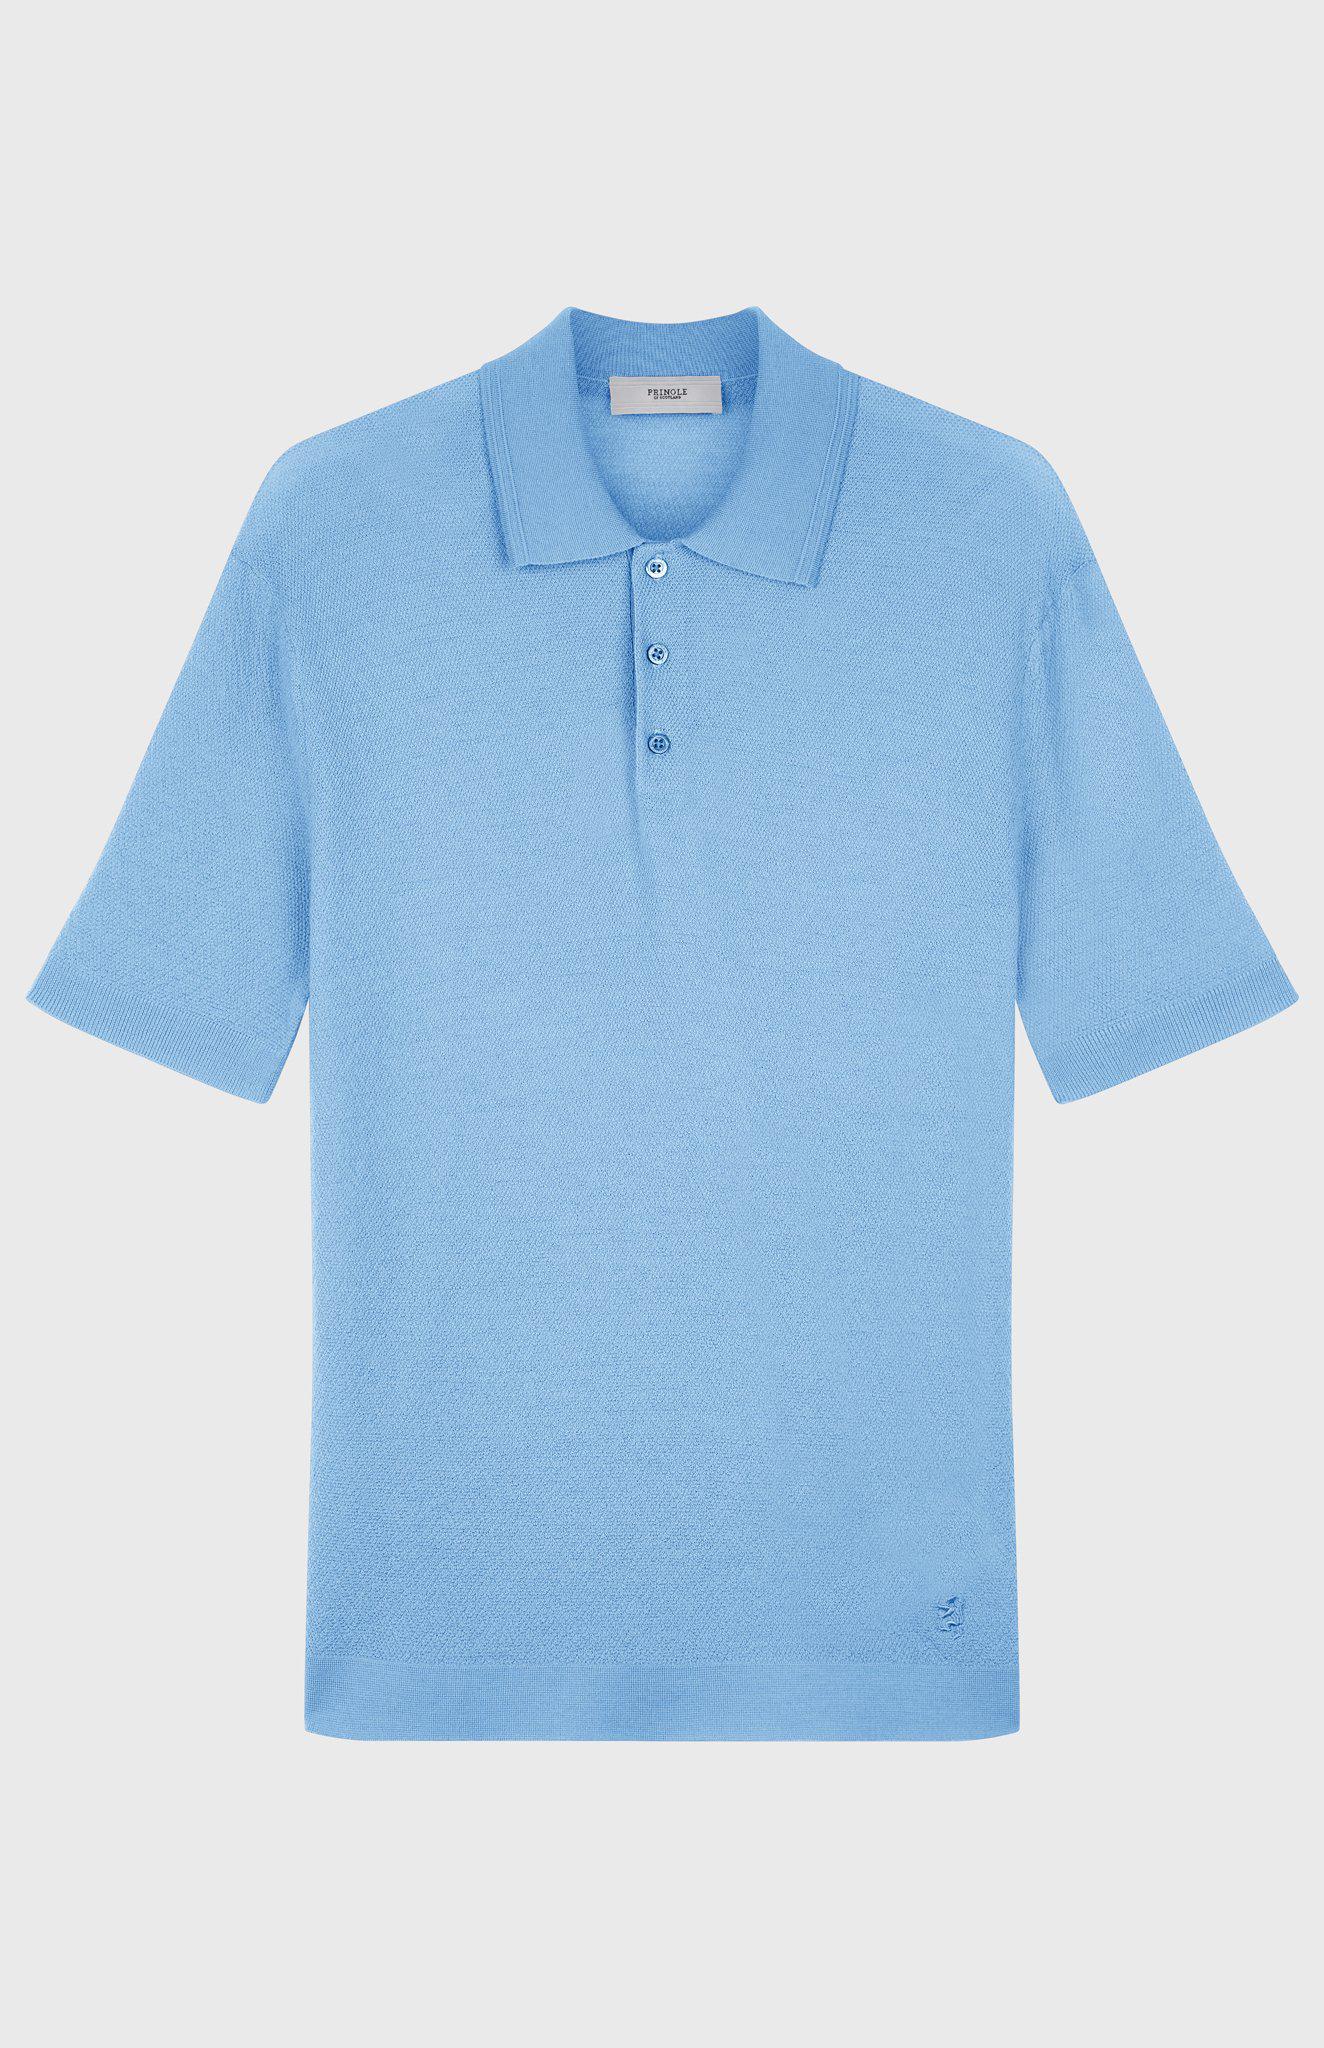 0c154d59 Pringle of Scotland - Blue Merino Wool Polo Shirt In Woad for Men - Lyst.  View fullscreen